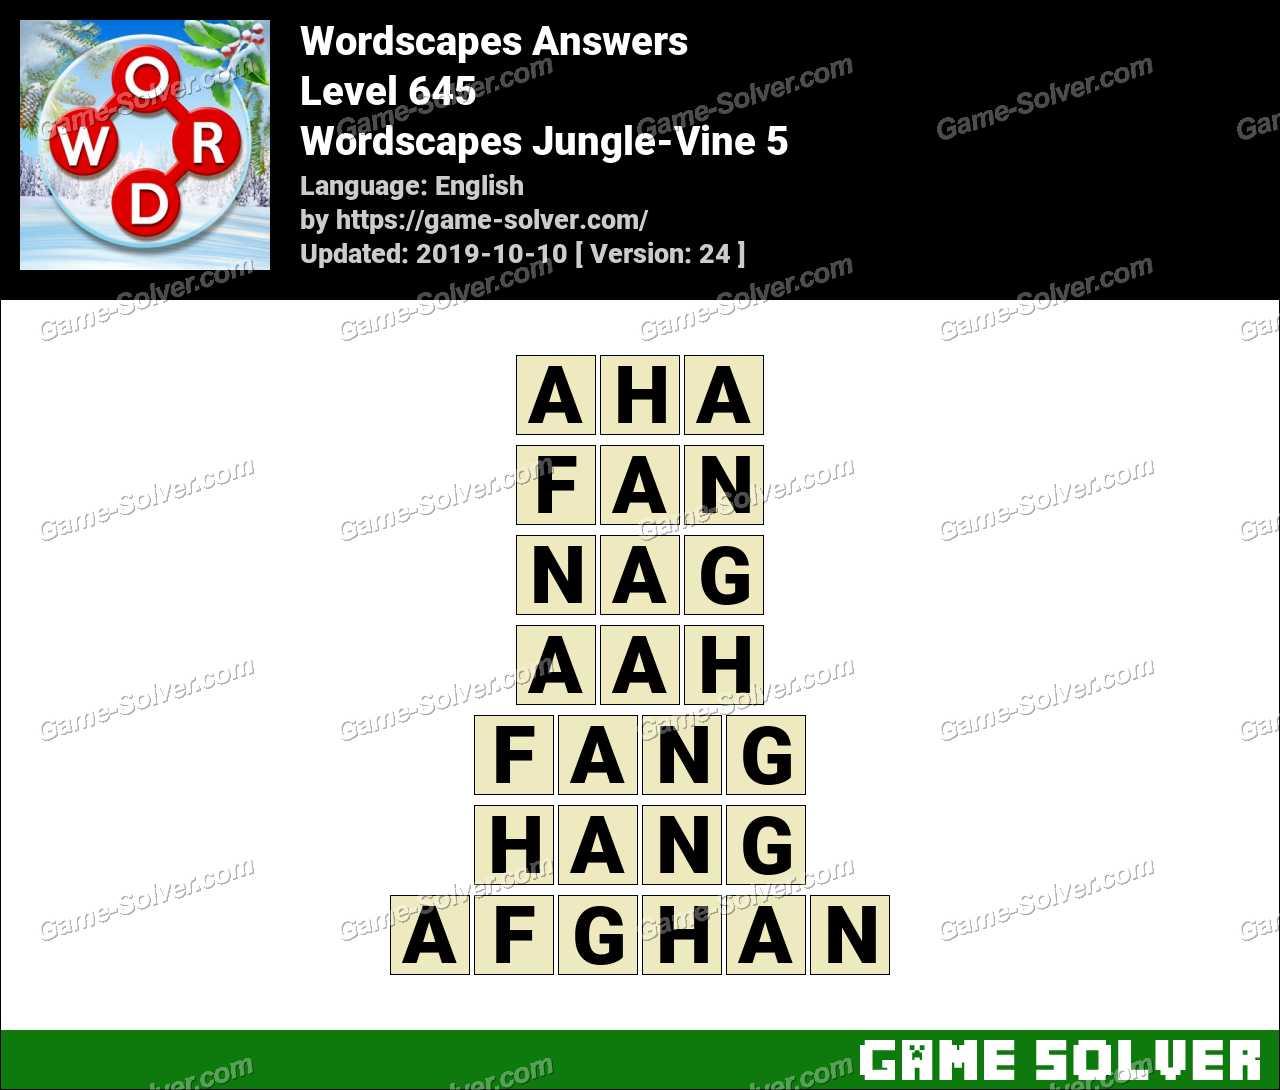 Wordscapes Jungle-Vine 5 Answers